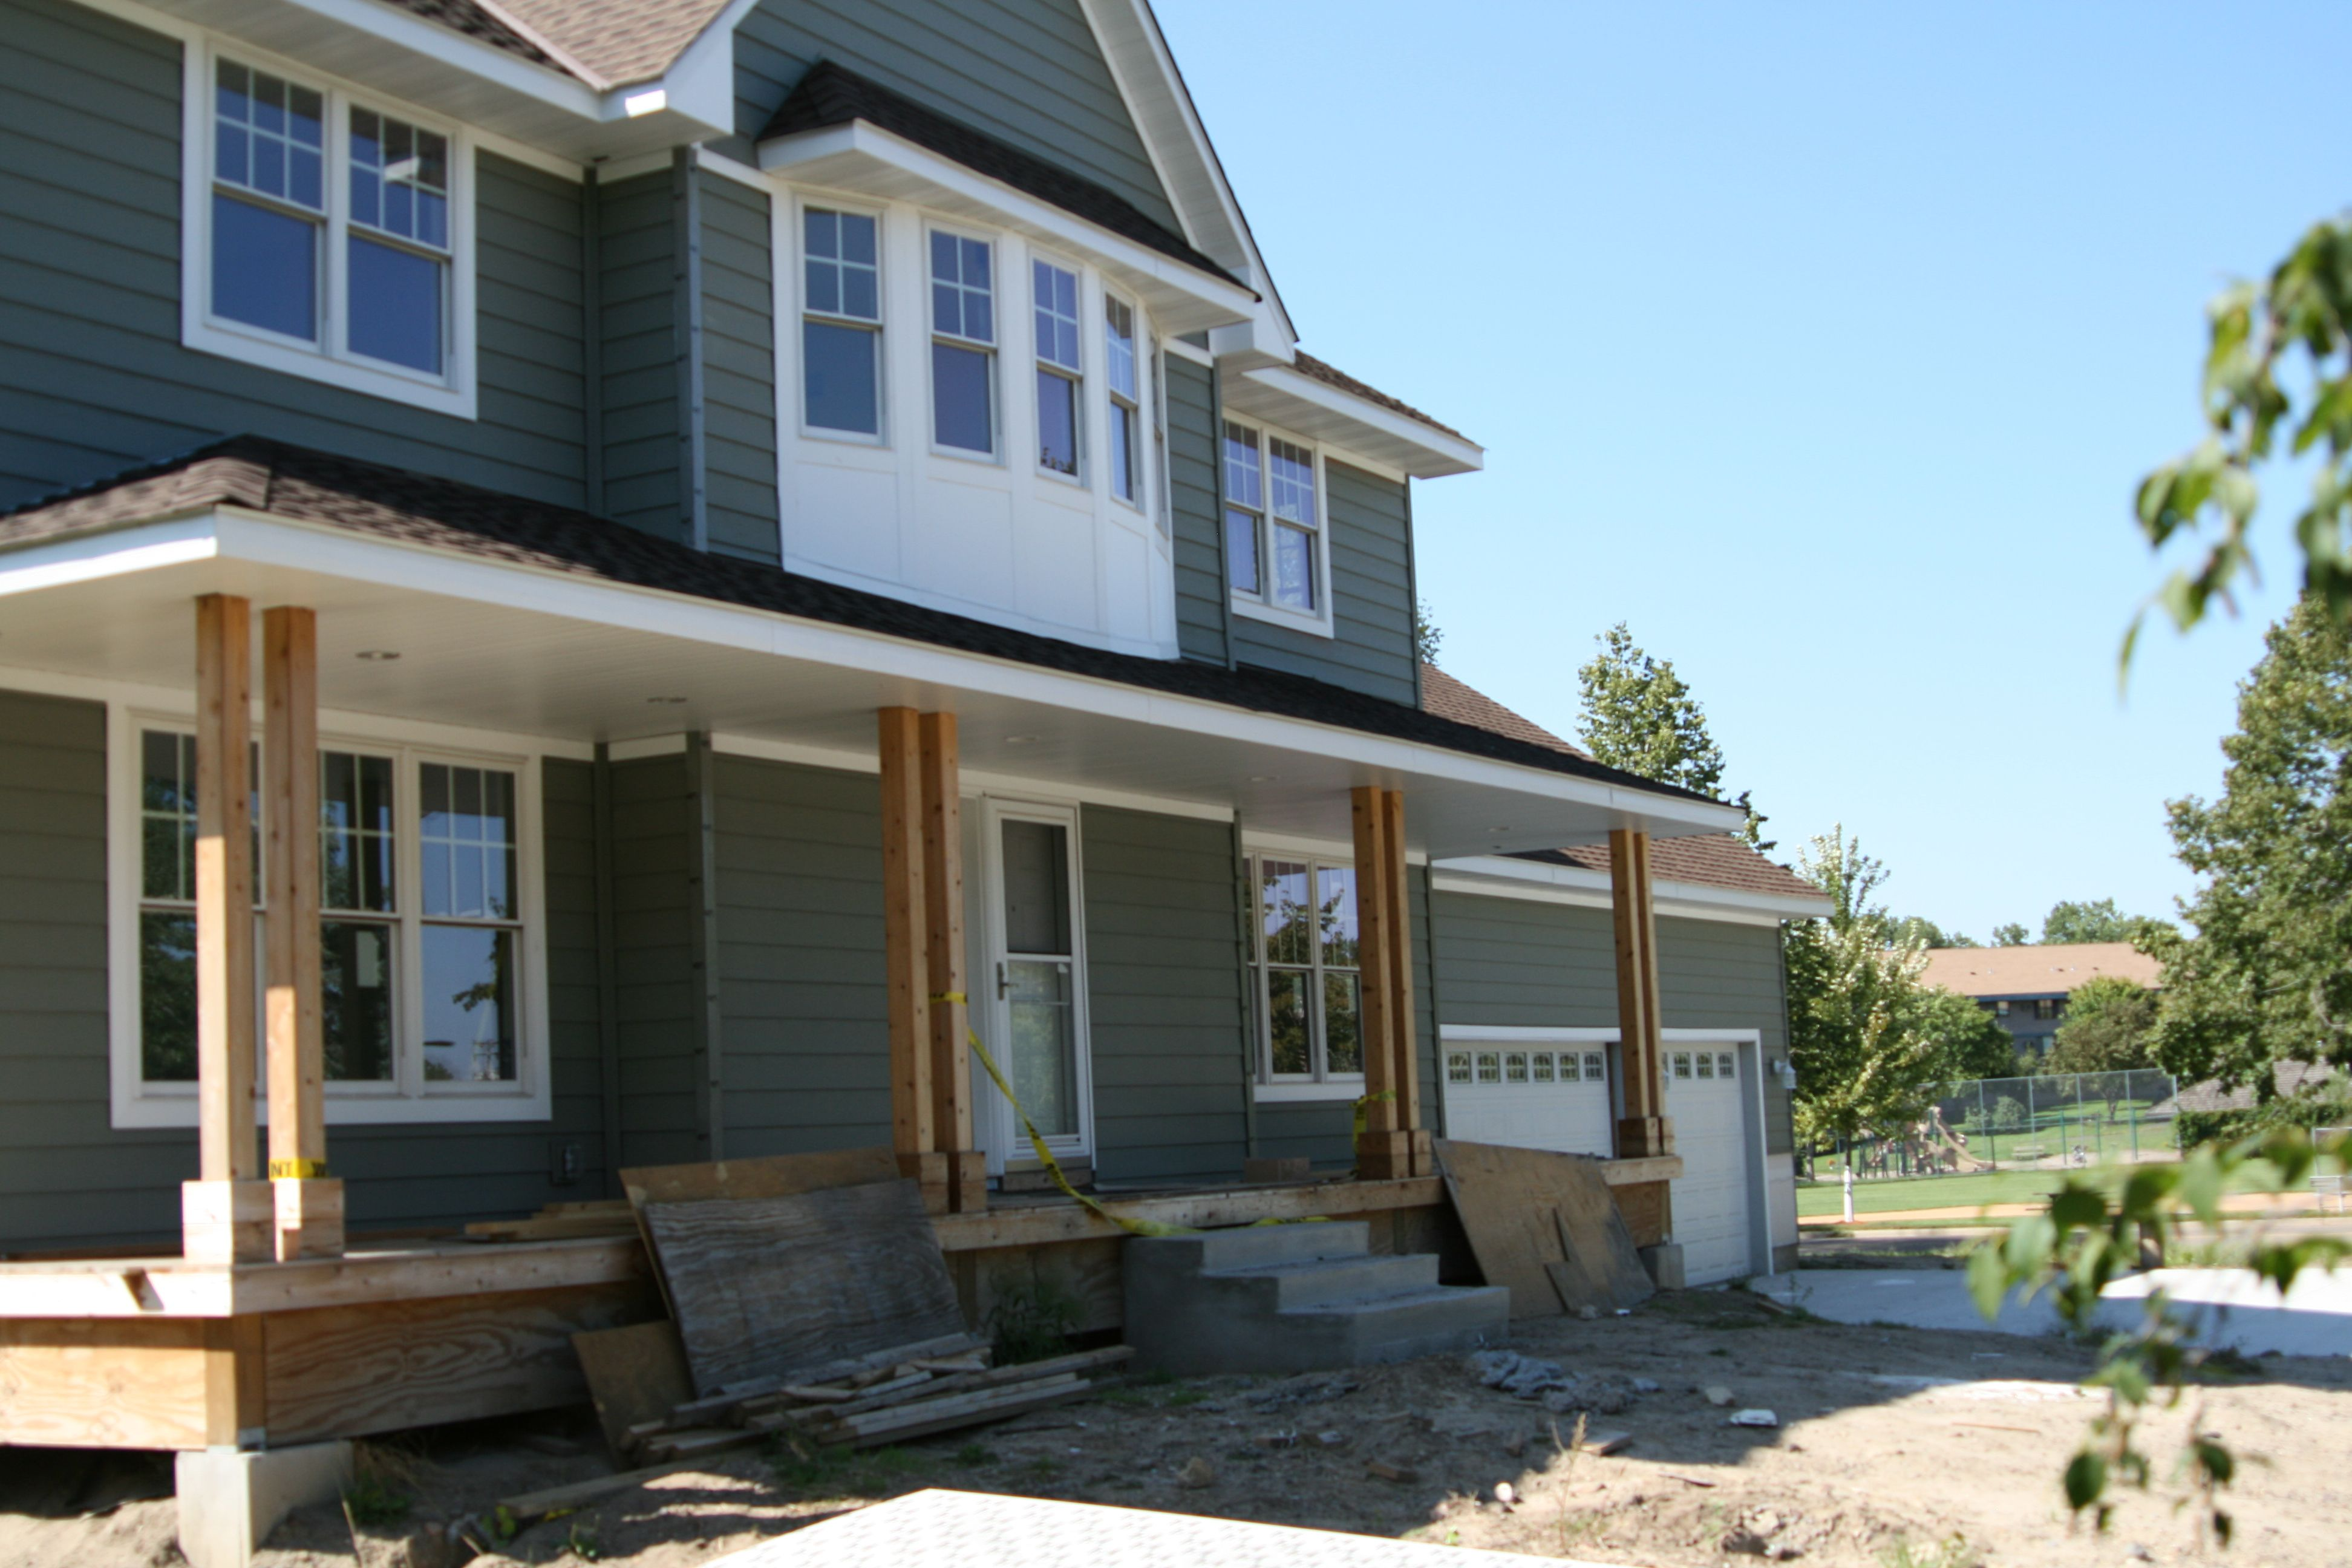 Everlast Polymeric Cladding Home Exterior Makeover Exterior House Colors House Exterior